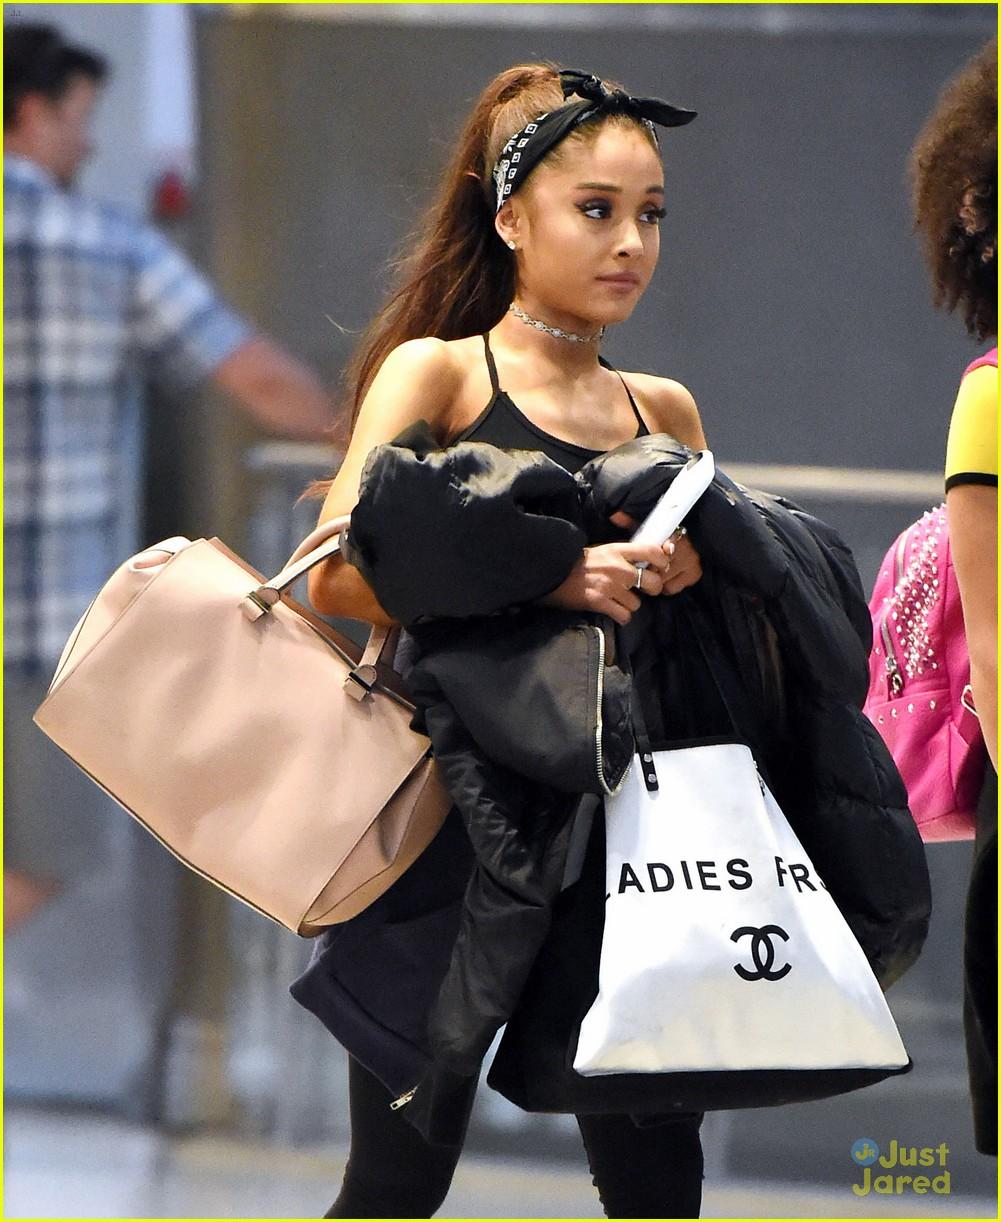 Ariana (actress) nudes (46 photo), Tits, Paparazzi, Boobs, braless 2020